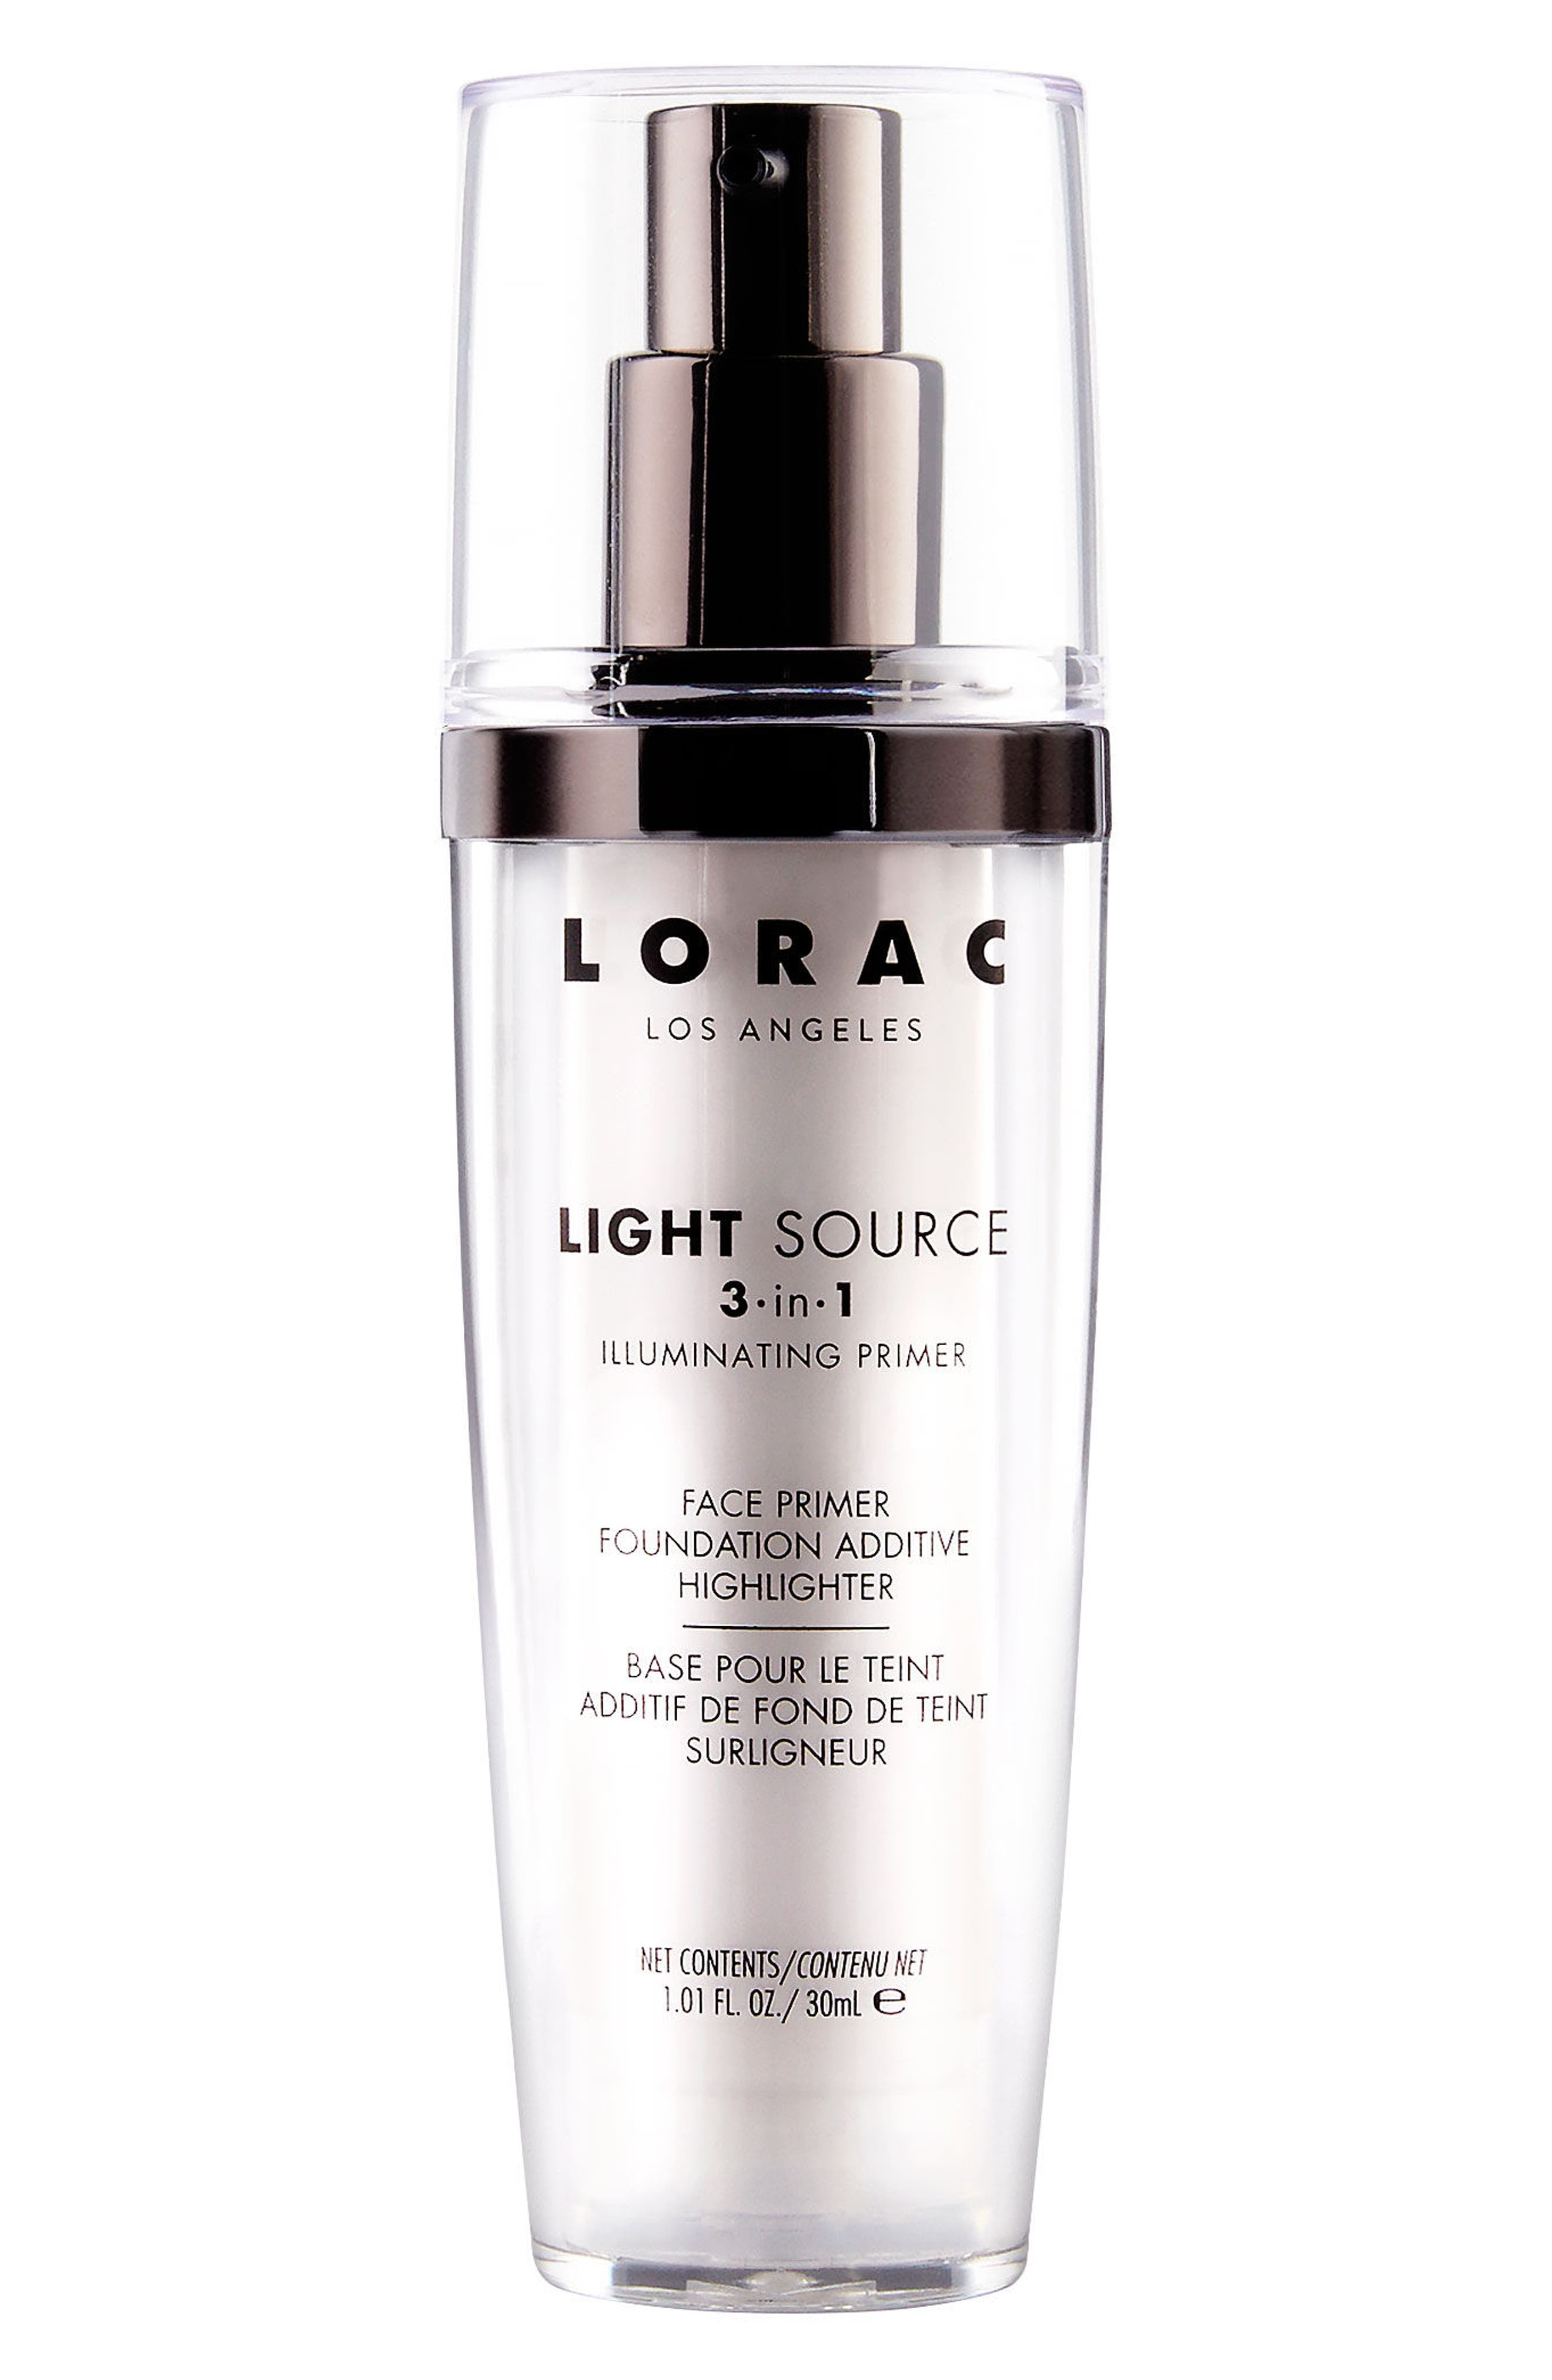 LORAC Light Source Illuminating 3-in-1 Primer